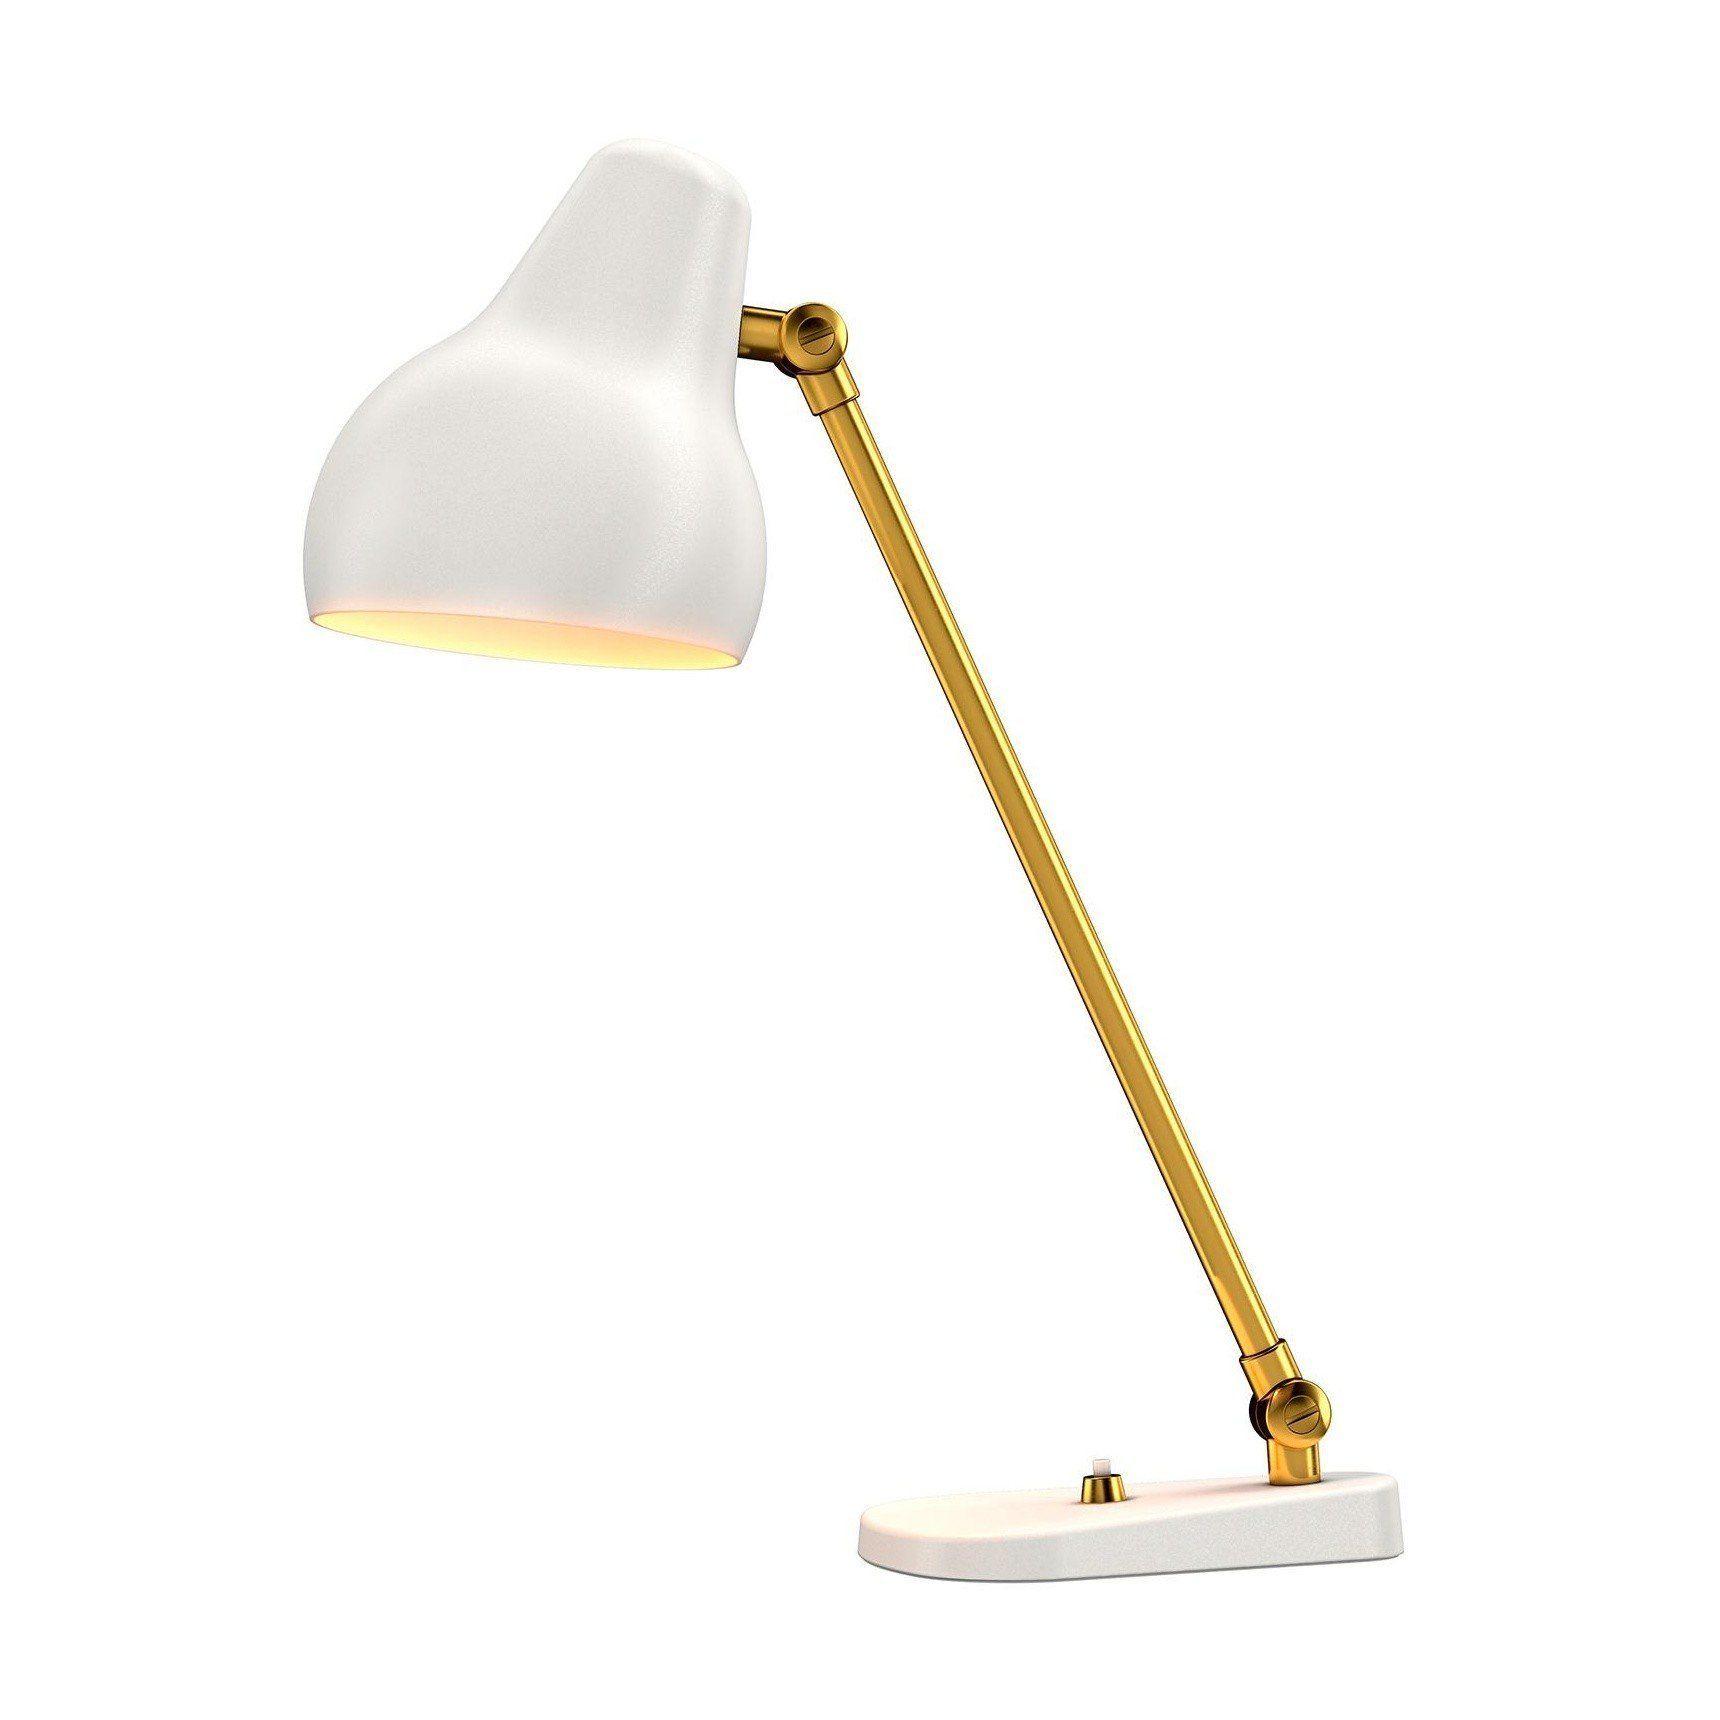 Vl38 led table lamp louis poulsen ambientedirect louis poulsen vl38 led table lamp whitepowder coated230v50hz aloadofball Choice Image